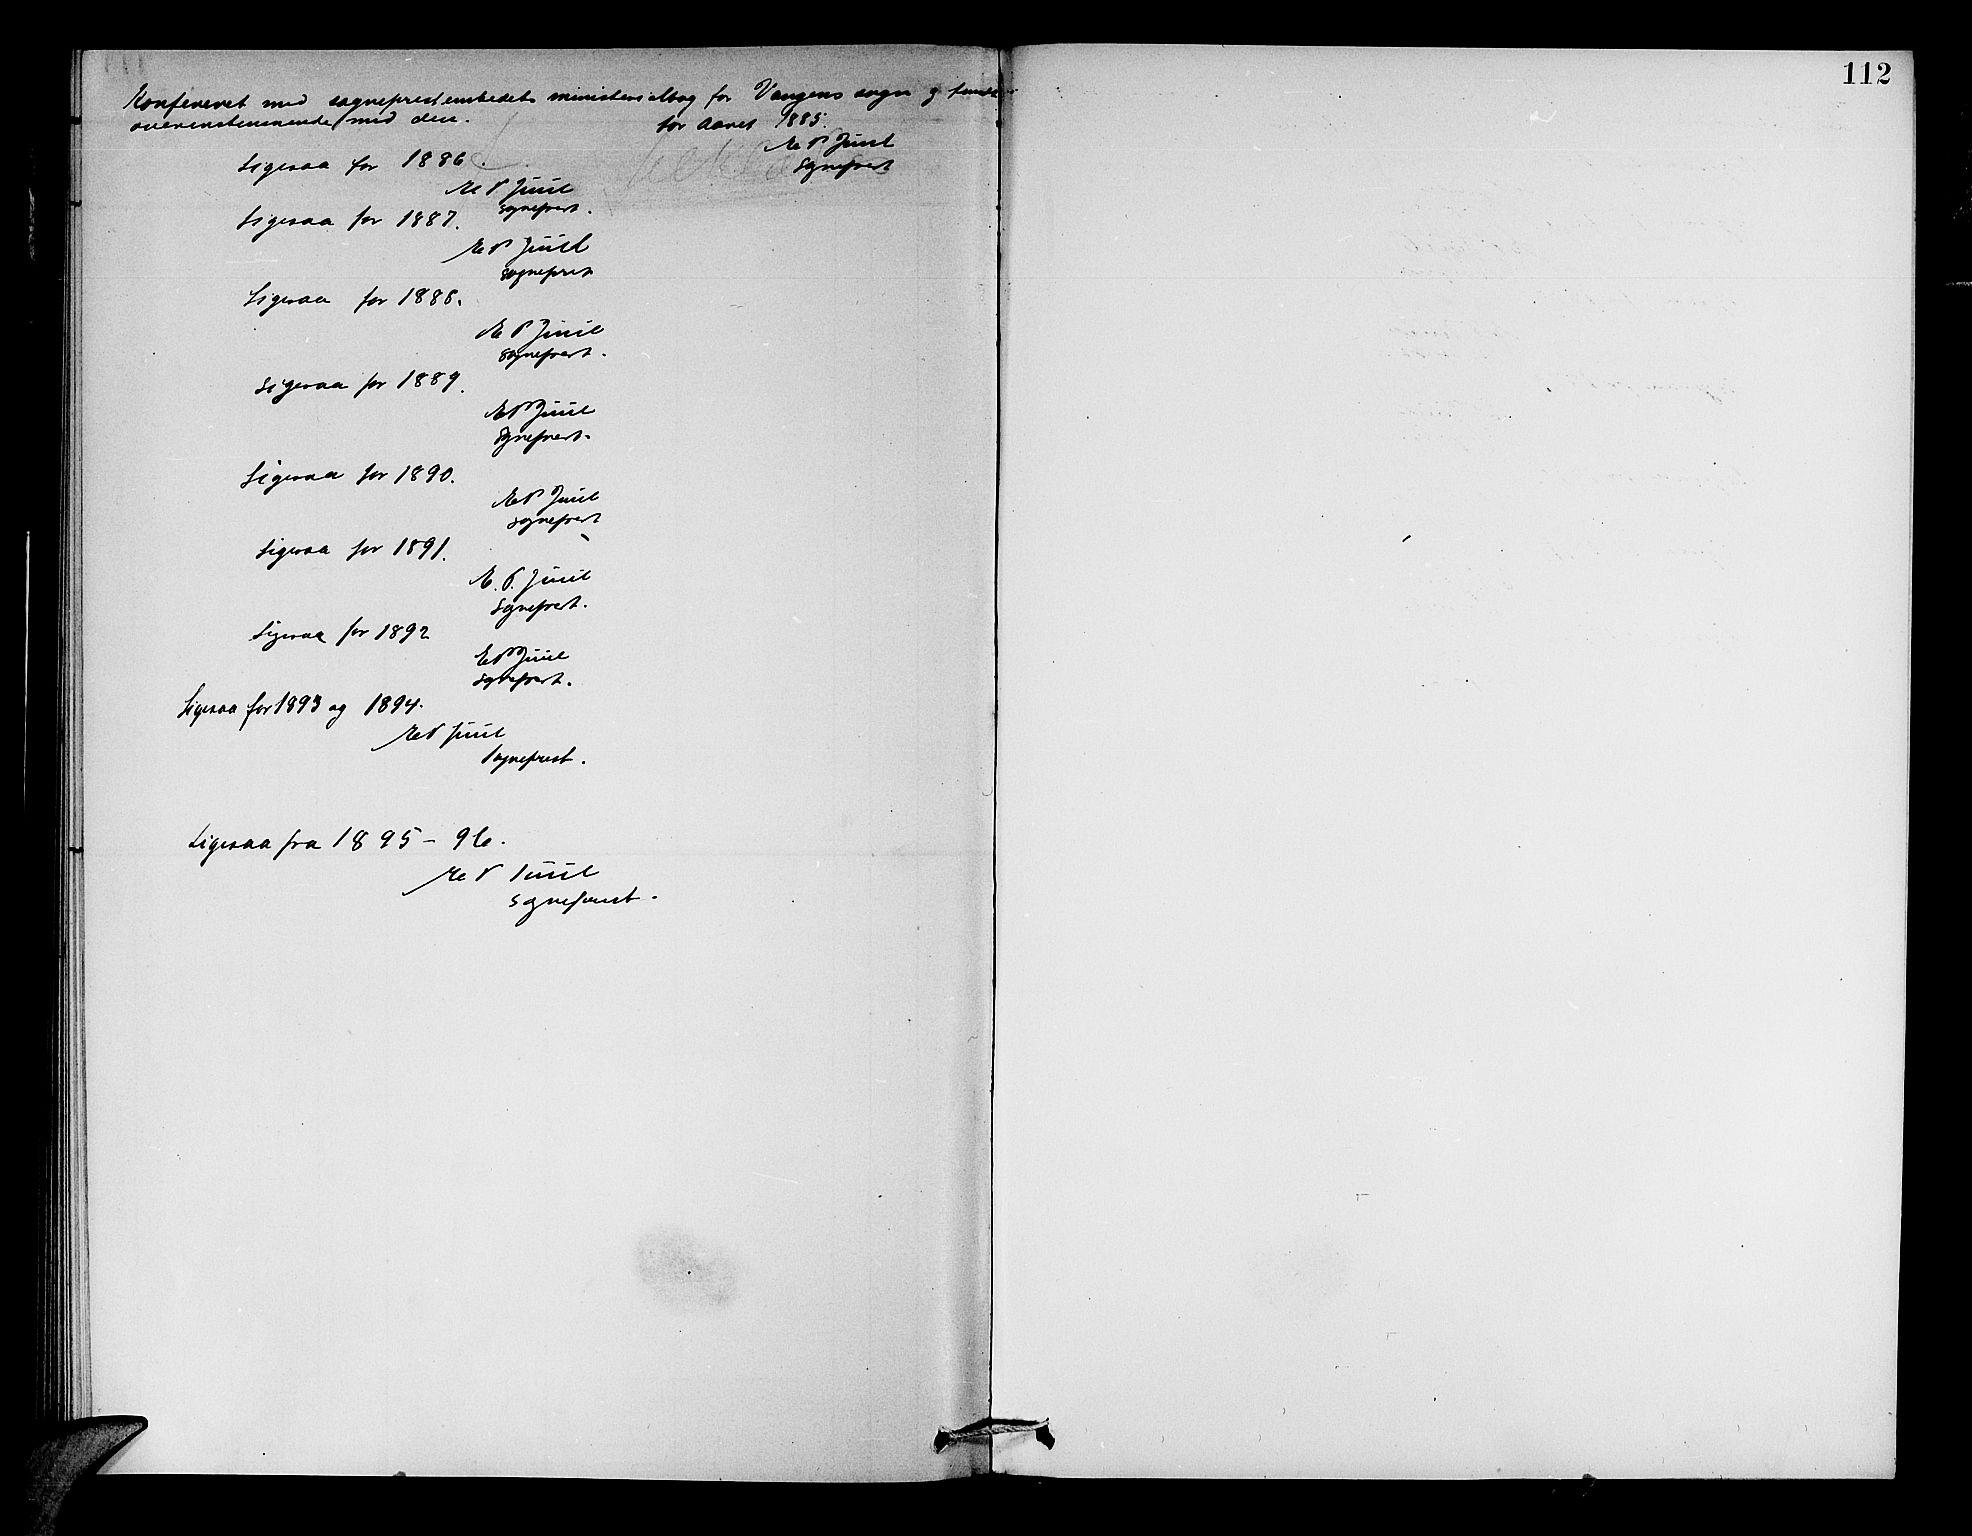 SAB, Aurland Sokneprestembete*, Klokkerbok nr. A 2, 1880-1895, s. 112